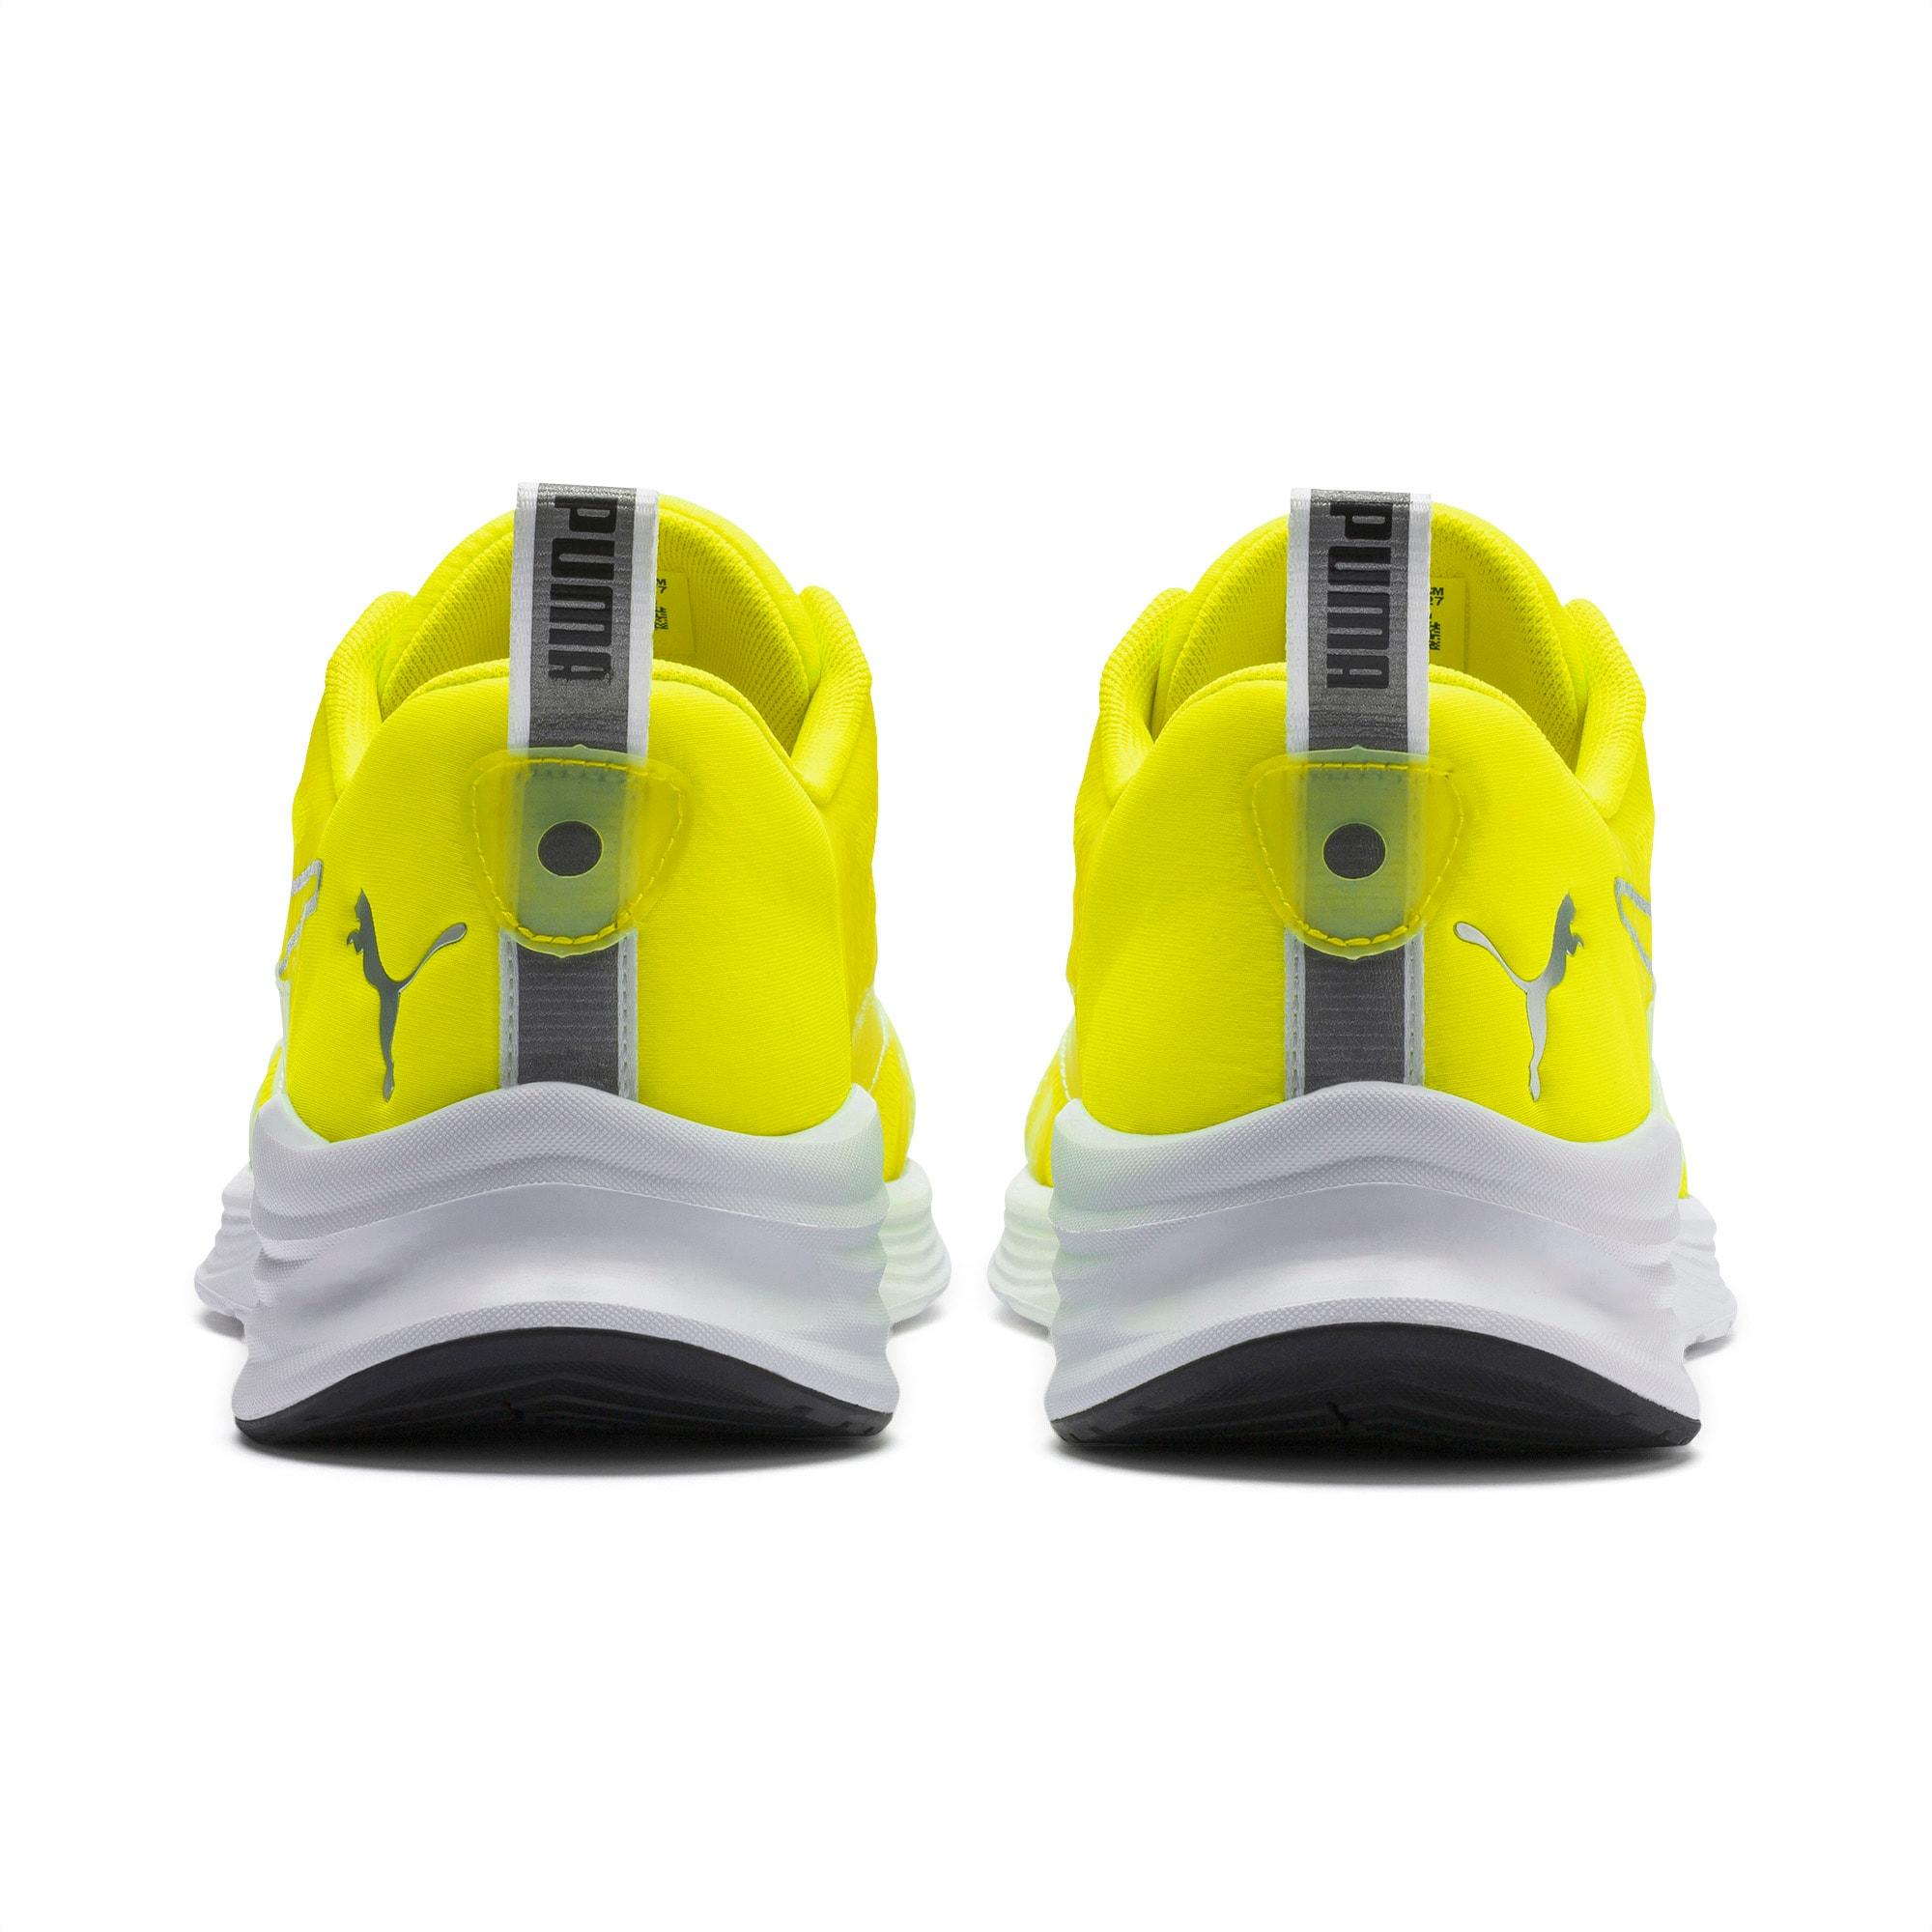 HYBRID Fuego Lights Men's Running Shoes